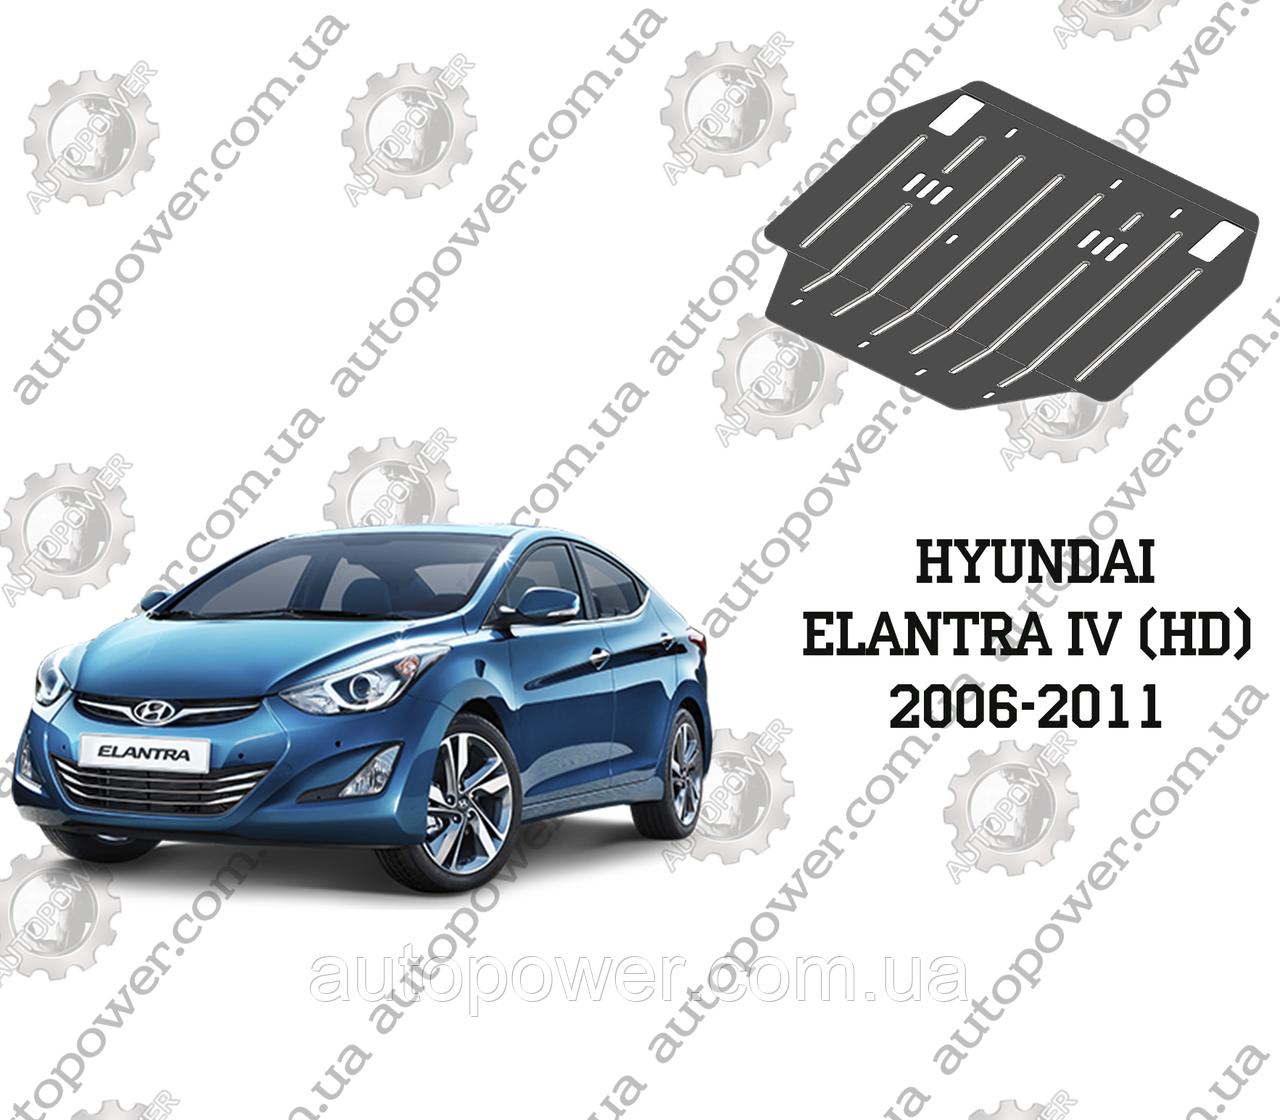 Защита HYUNDAI ELANTRA IV (HD) 2006-2011